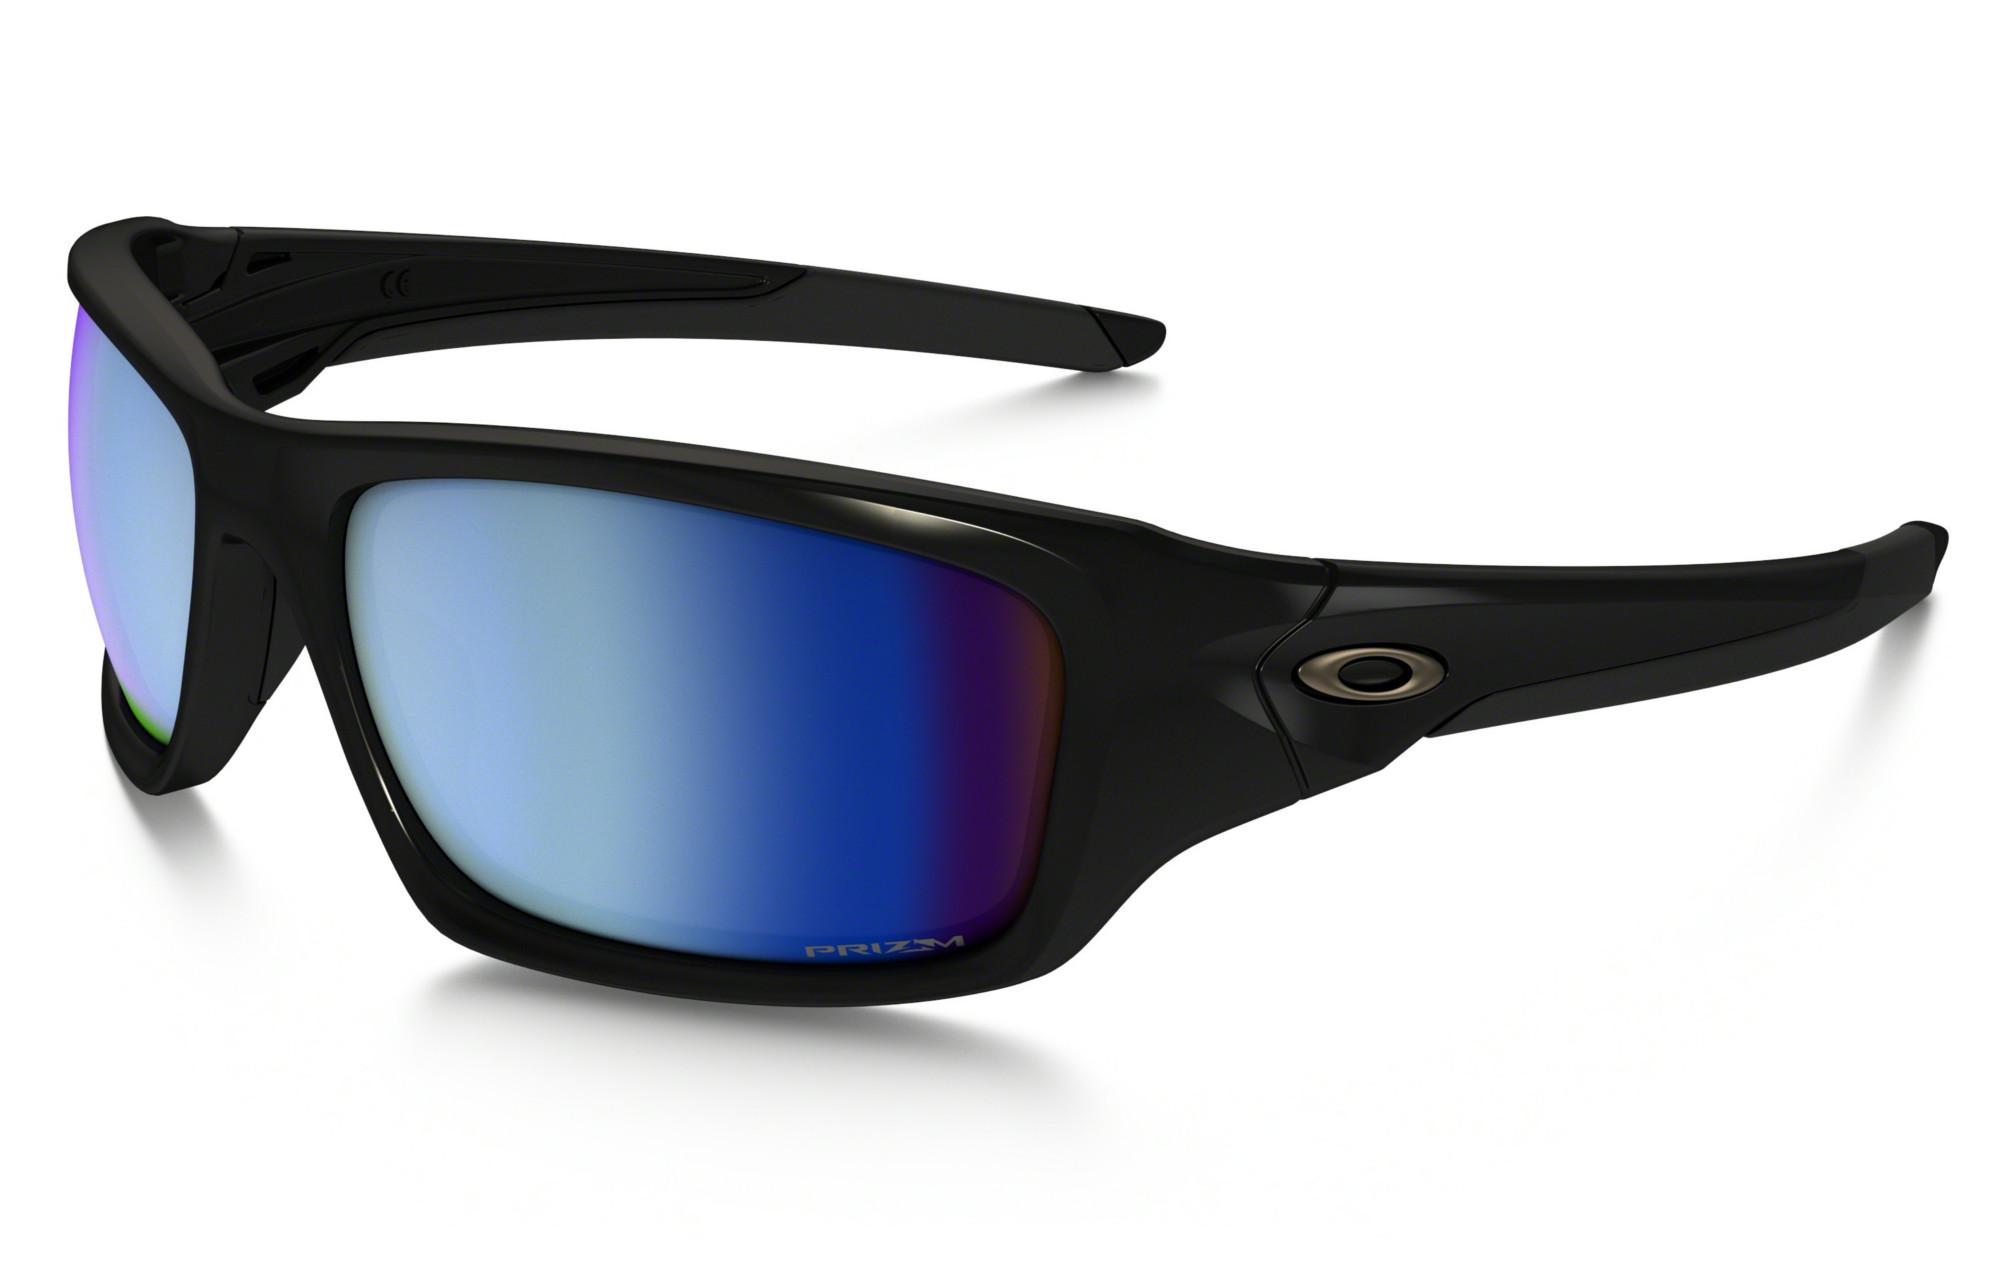 OAKLEY VALVE Sunglasses Black Blue Prizm Deep Water Polarized Ref OO9236 19